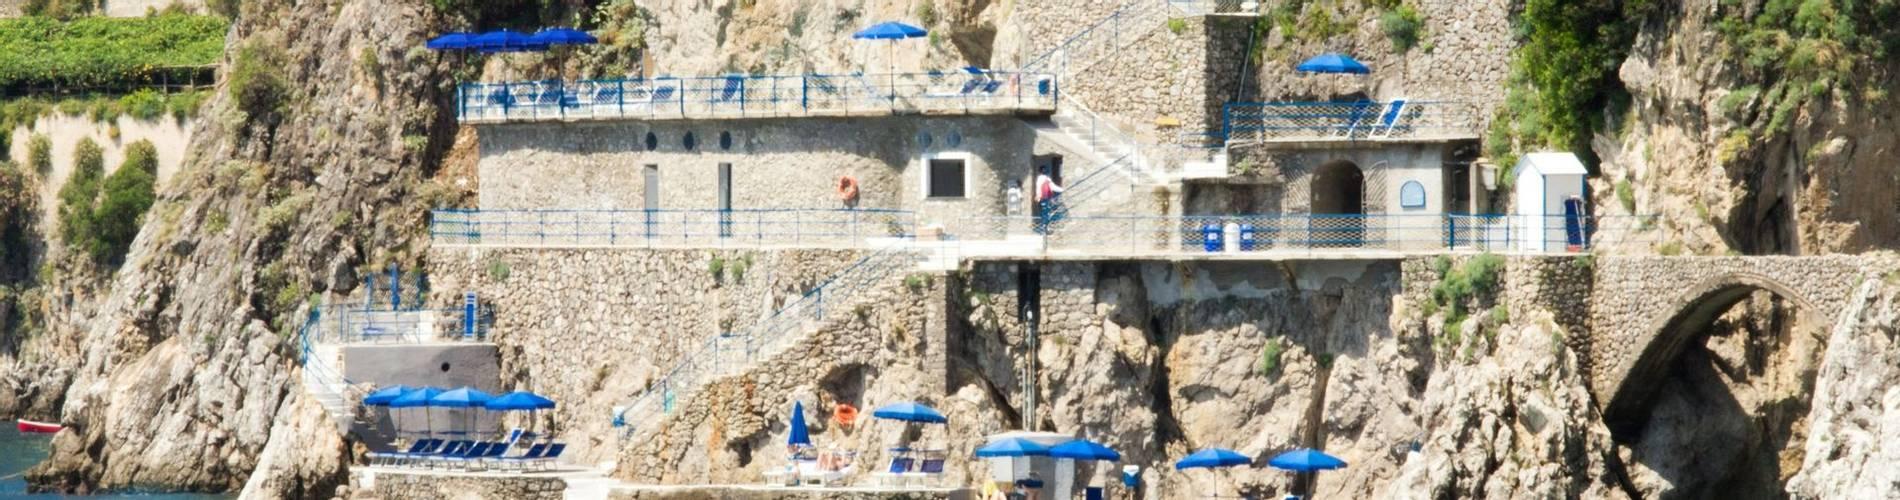 Miramalfi, Amalfi Coast, Italy (34).jpg